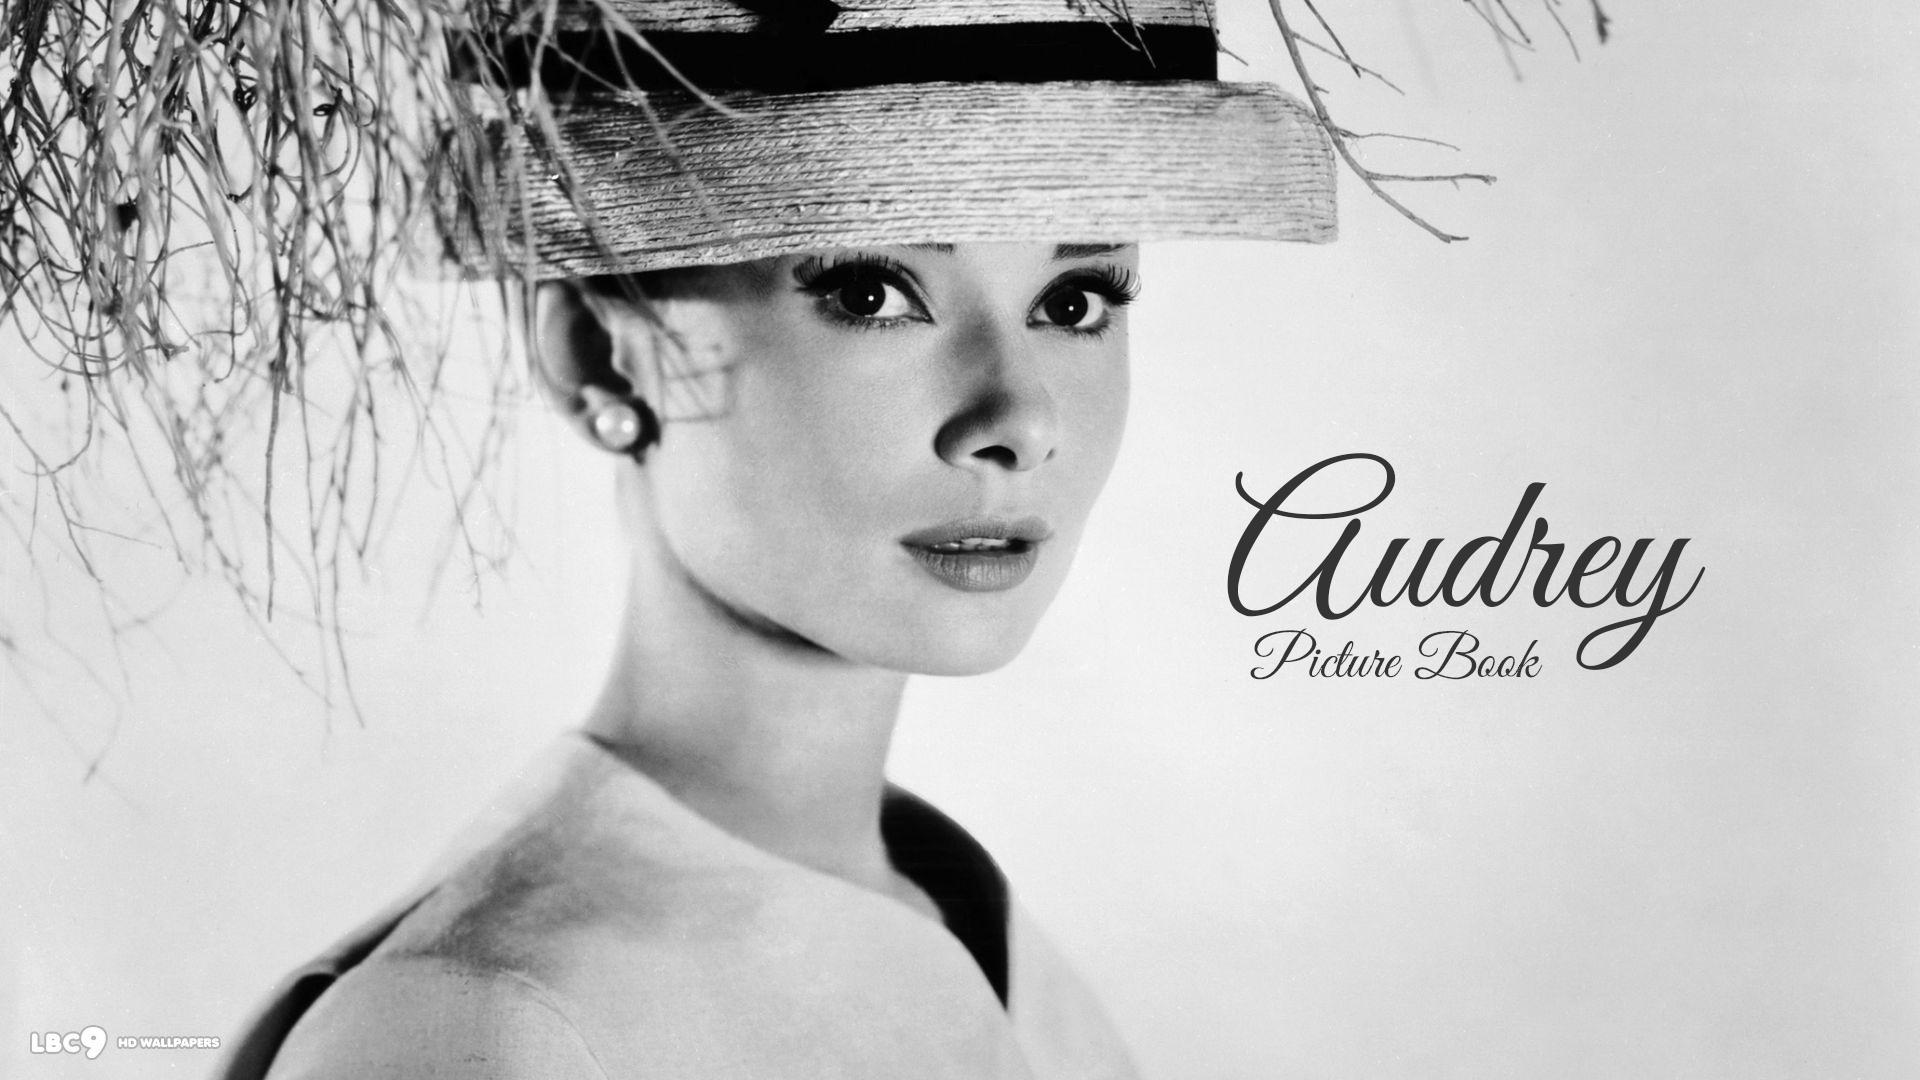 Audrey-header.jpg